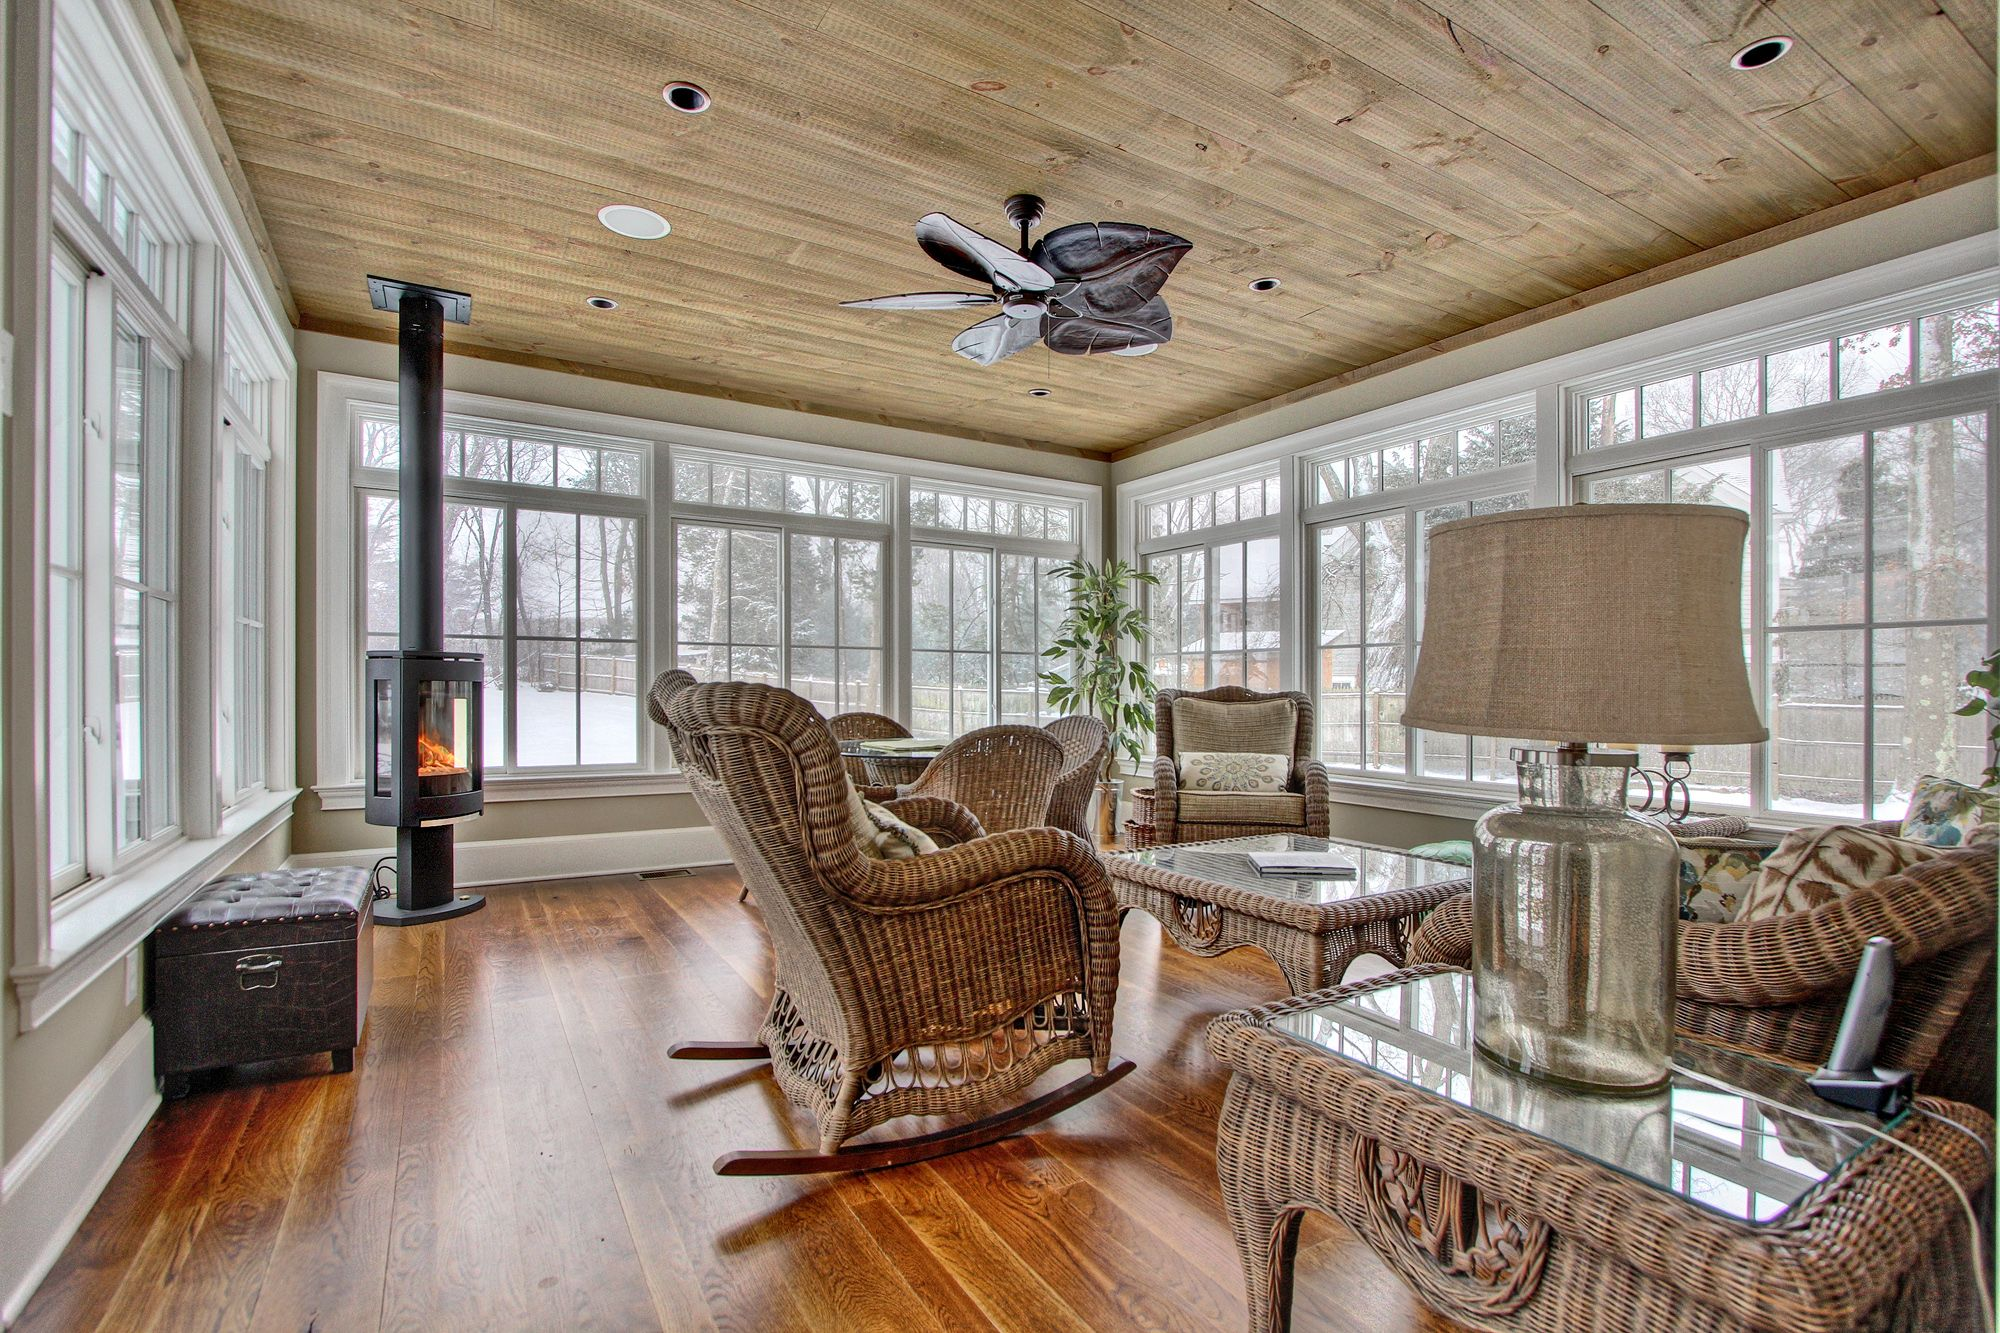 Rustic Sunroom Antique Wood Floor Burning Stove